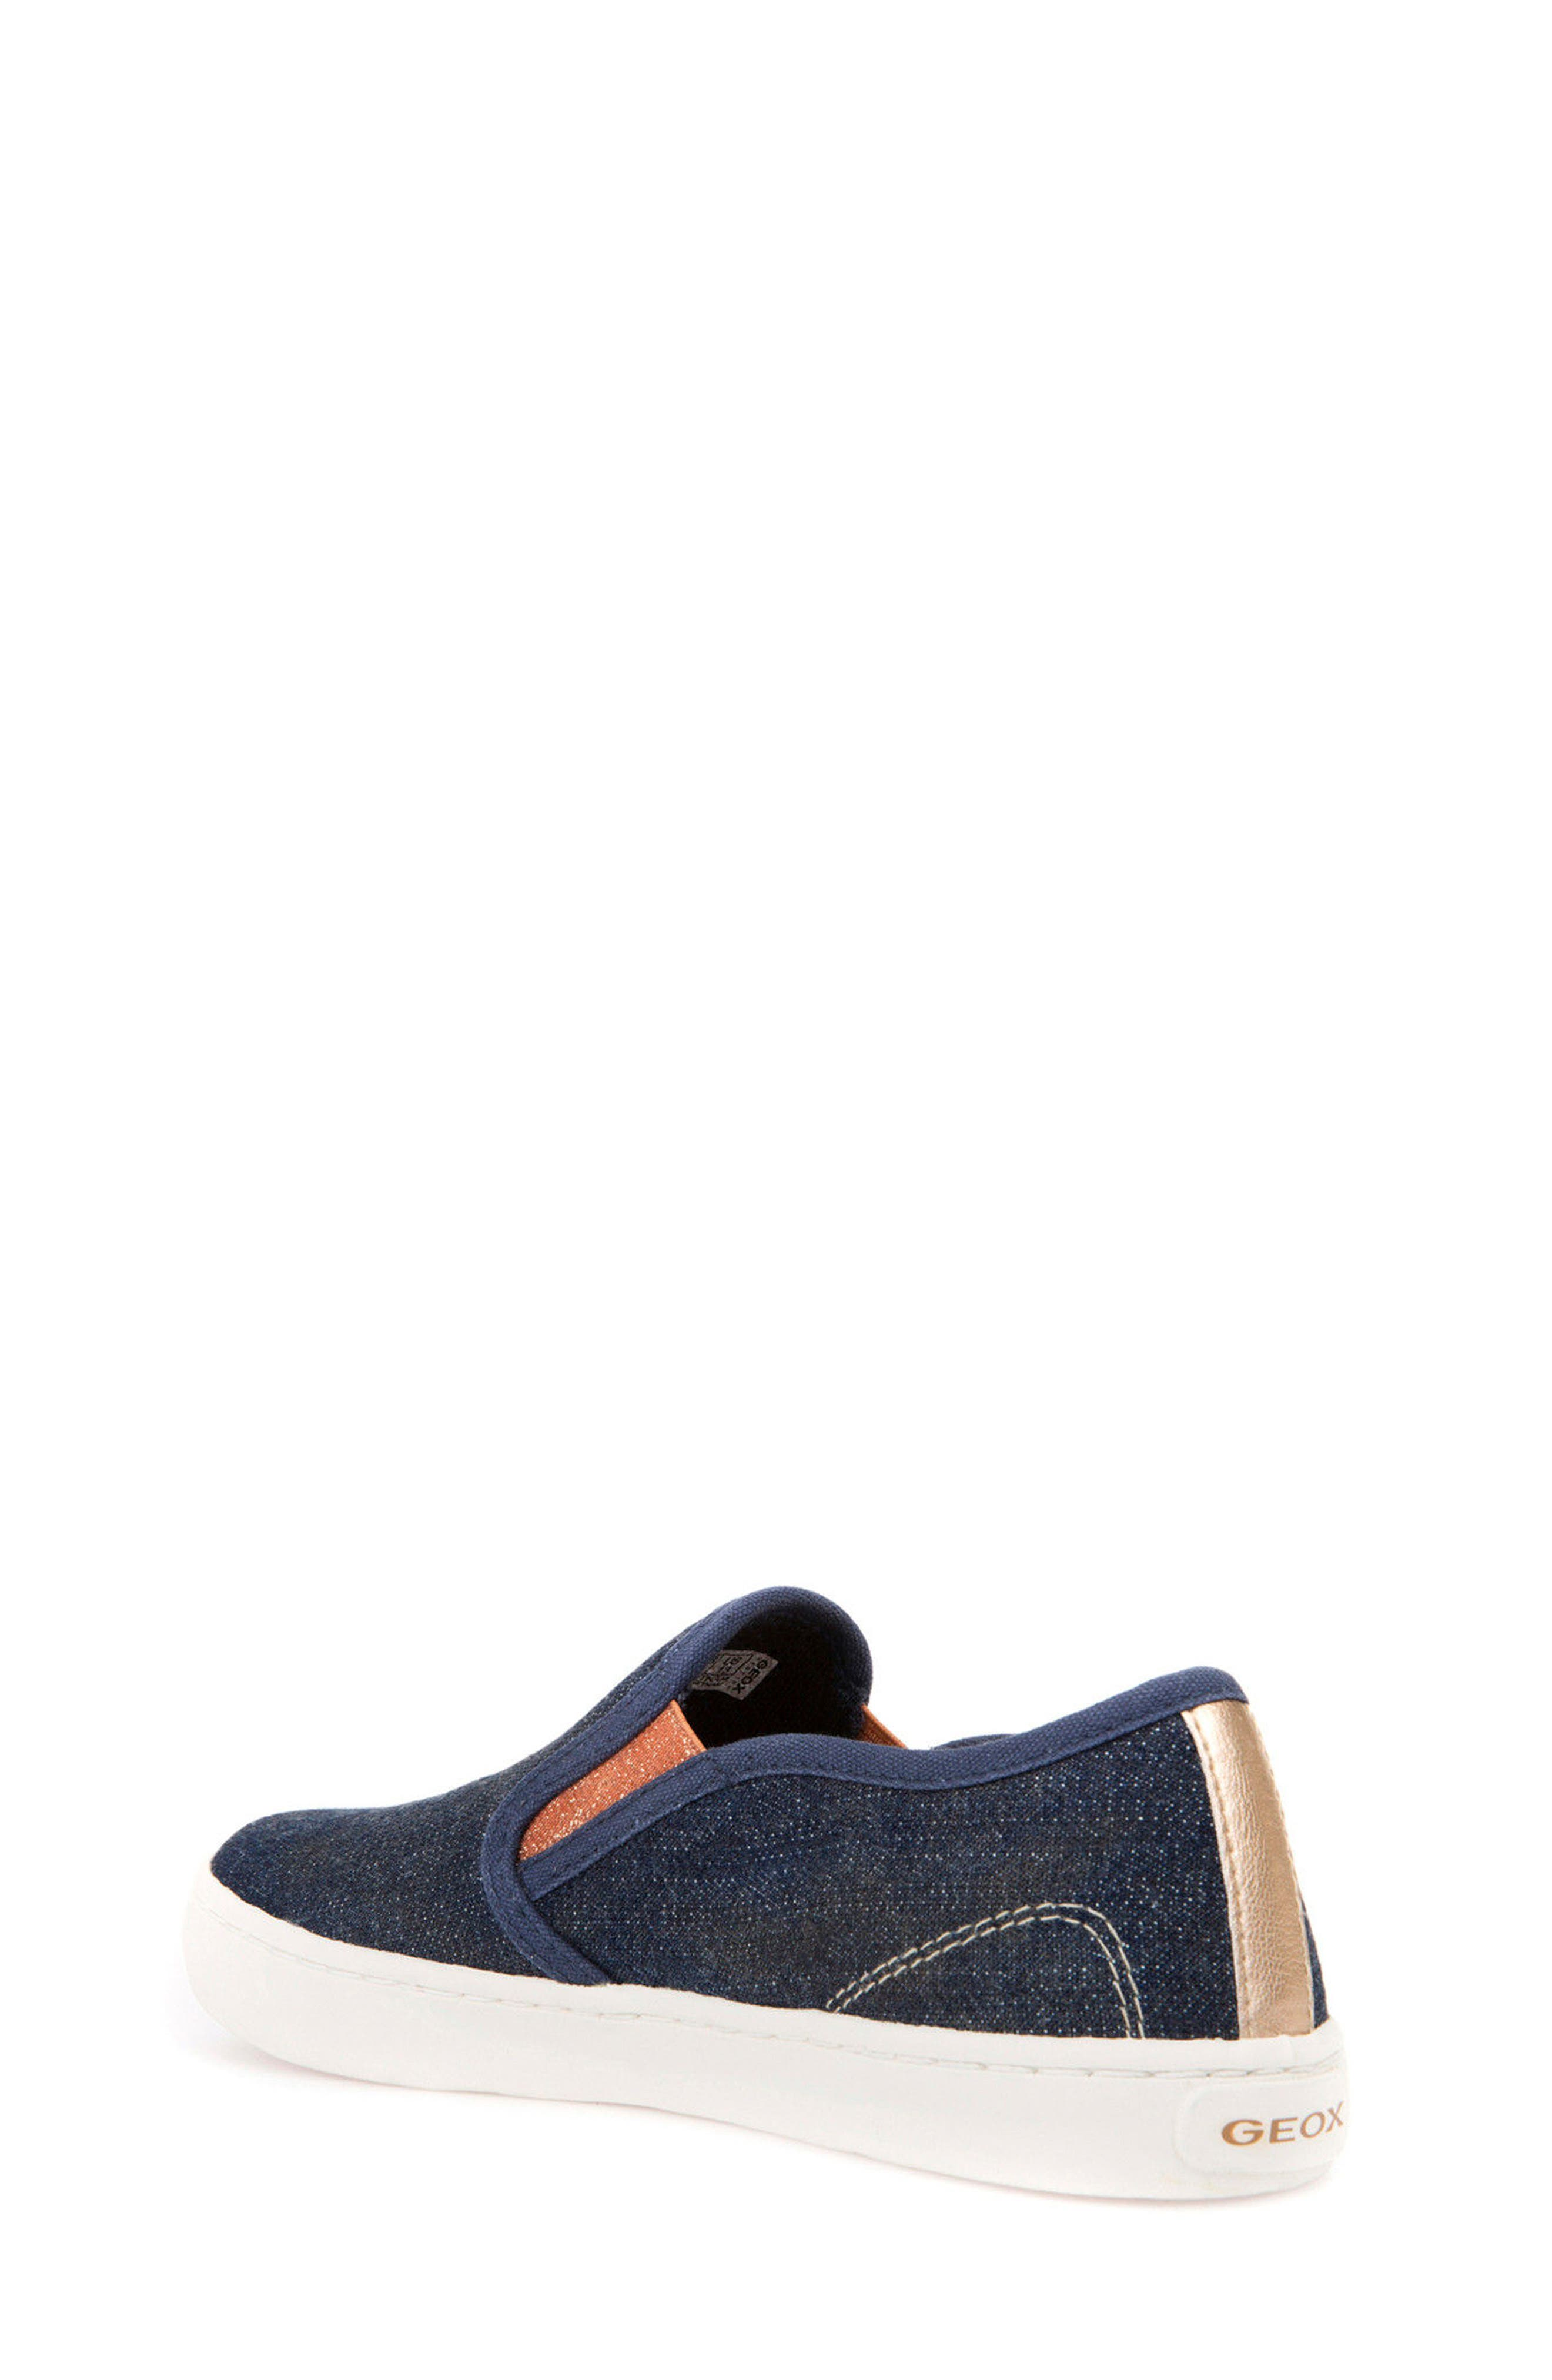 Jr Kiwi Slip-On Waterproof Sneaker,                             Alternate thumbnail 2, color,                             JEANS